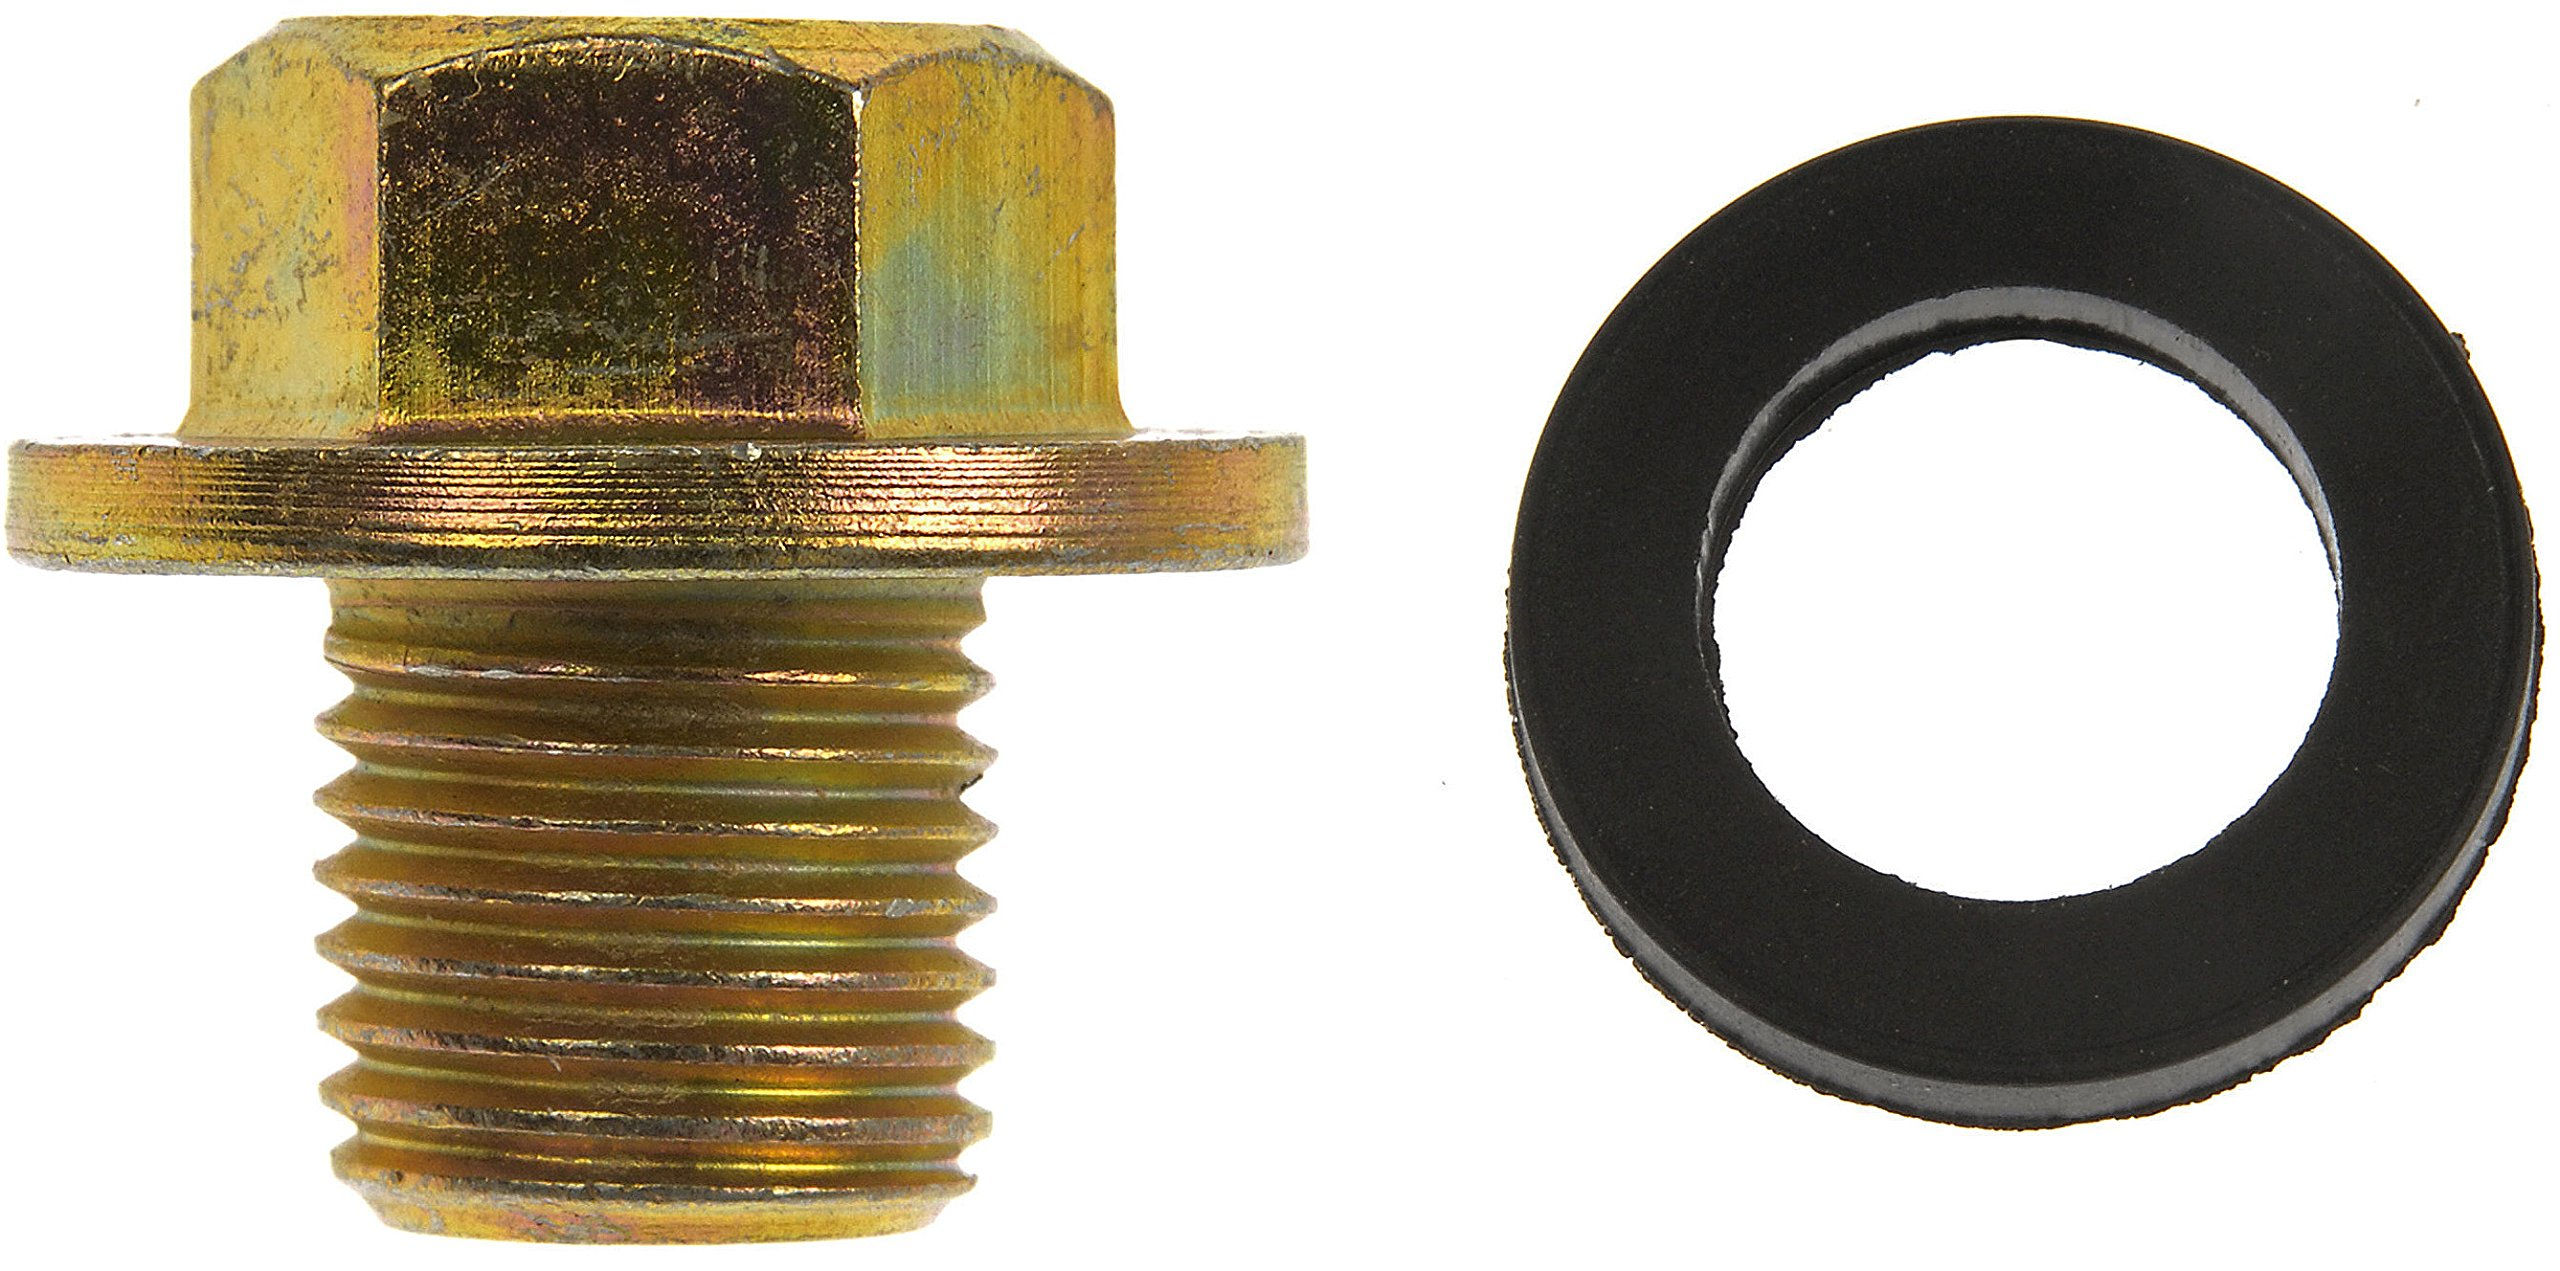 Dorman 090-038CD Oil Drain Plug Standard M12-1.25 Head Size 14mm for Select Models